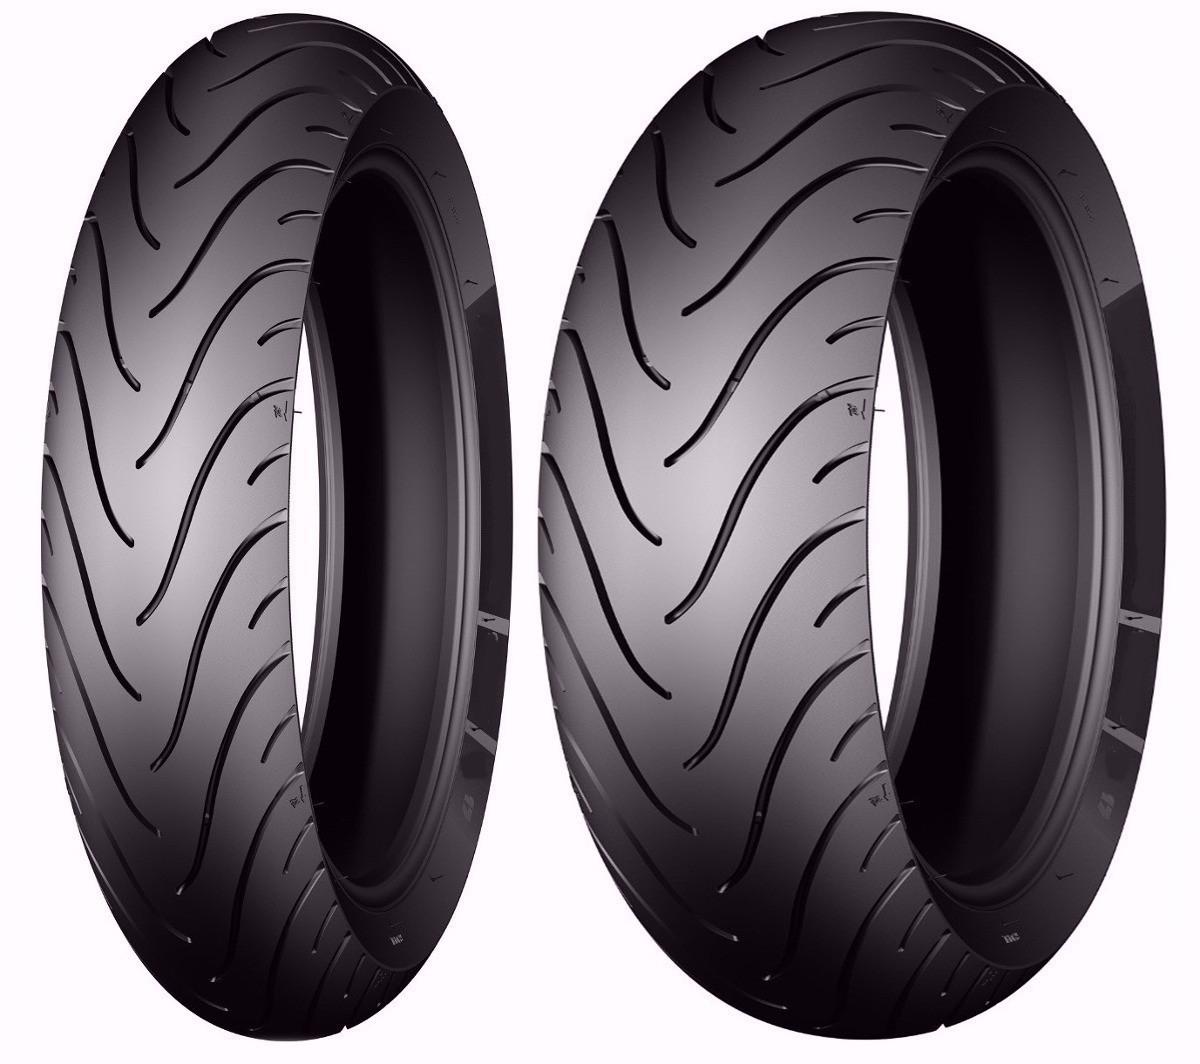 Par Pneu Michelin 120/70-17 + 180/55-17 Pilot Street Radial XJ6 / Hornet / Bandit / CBR 1000 RR / YZF R1 / YZF R6